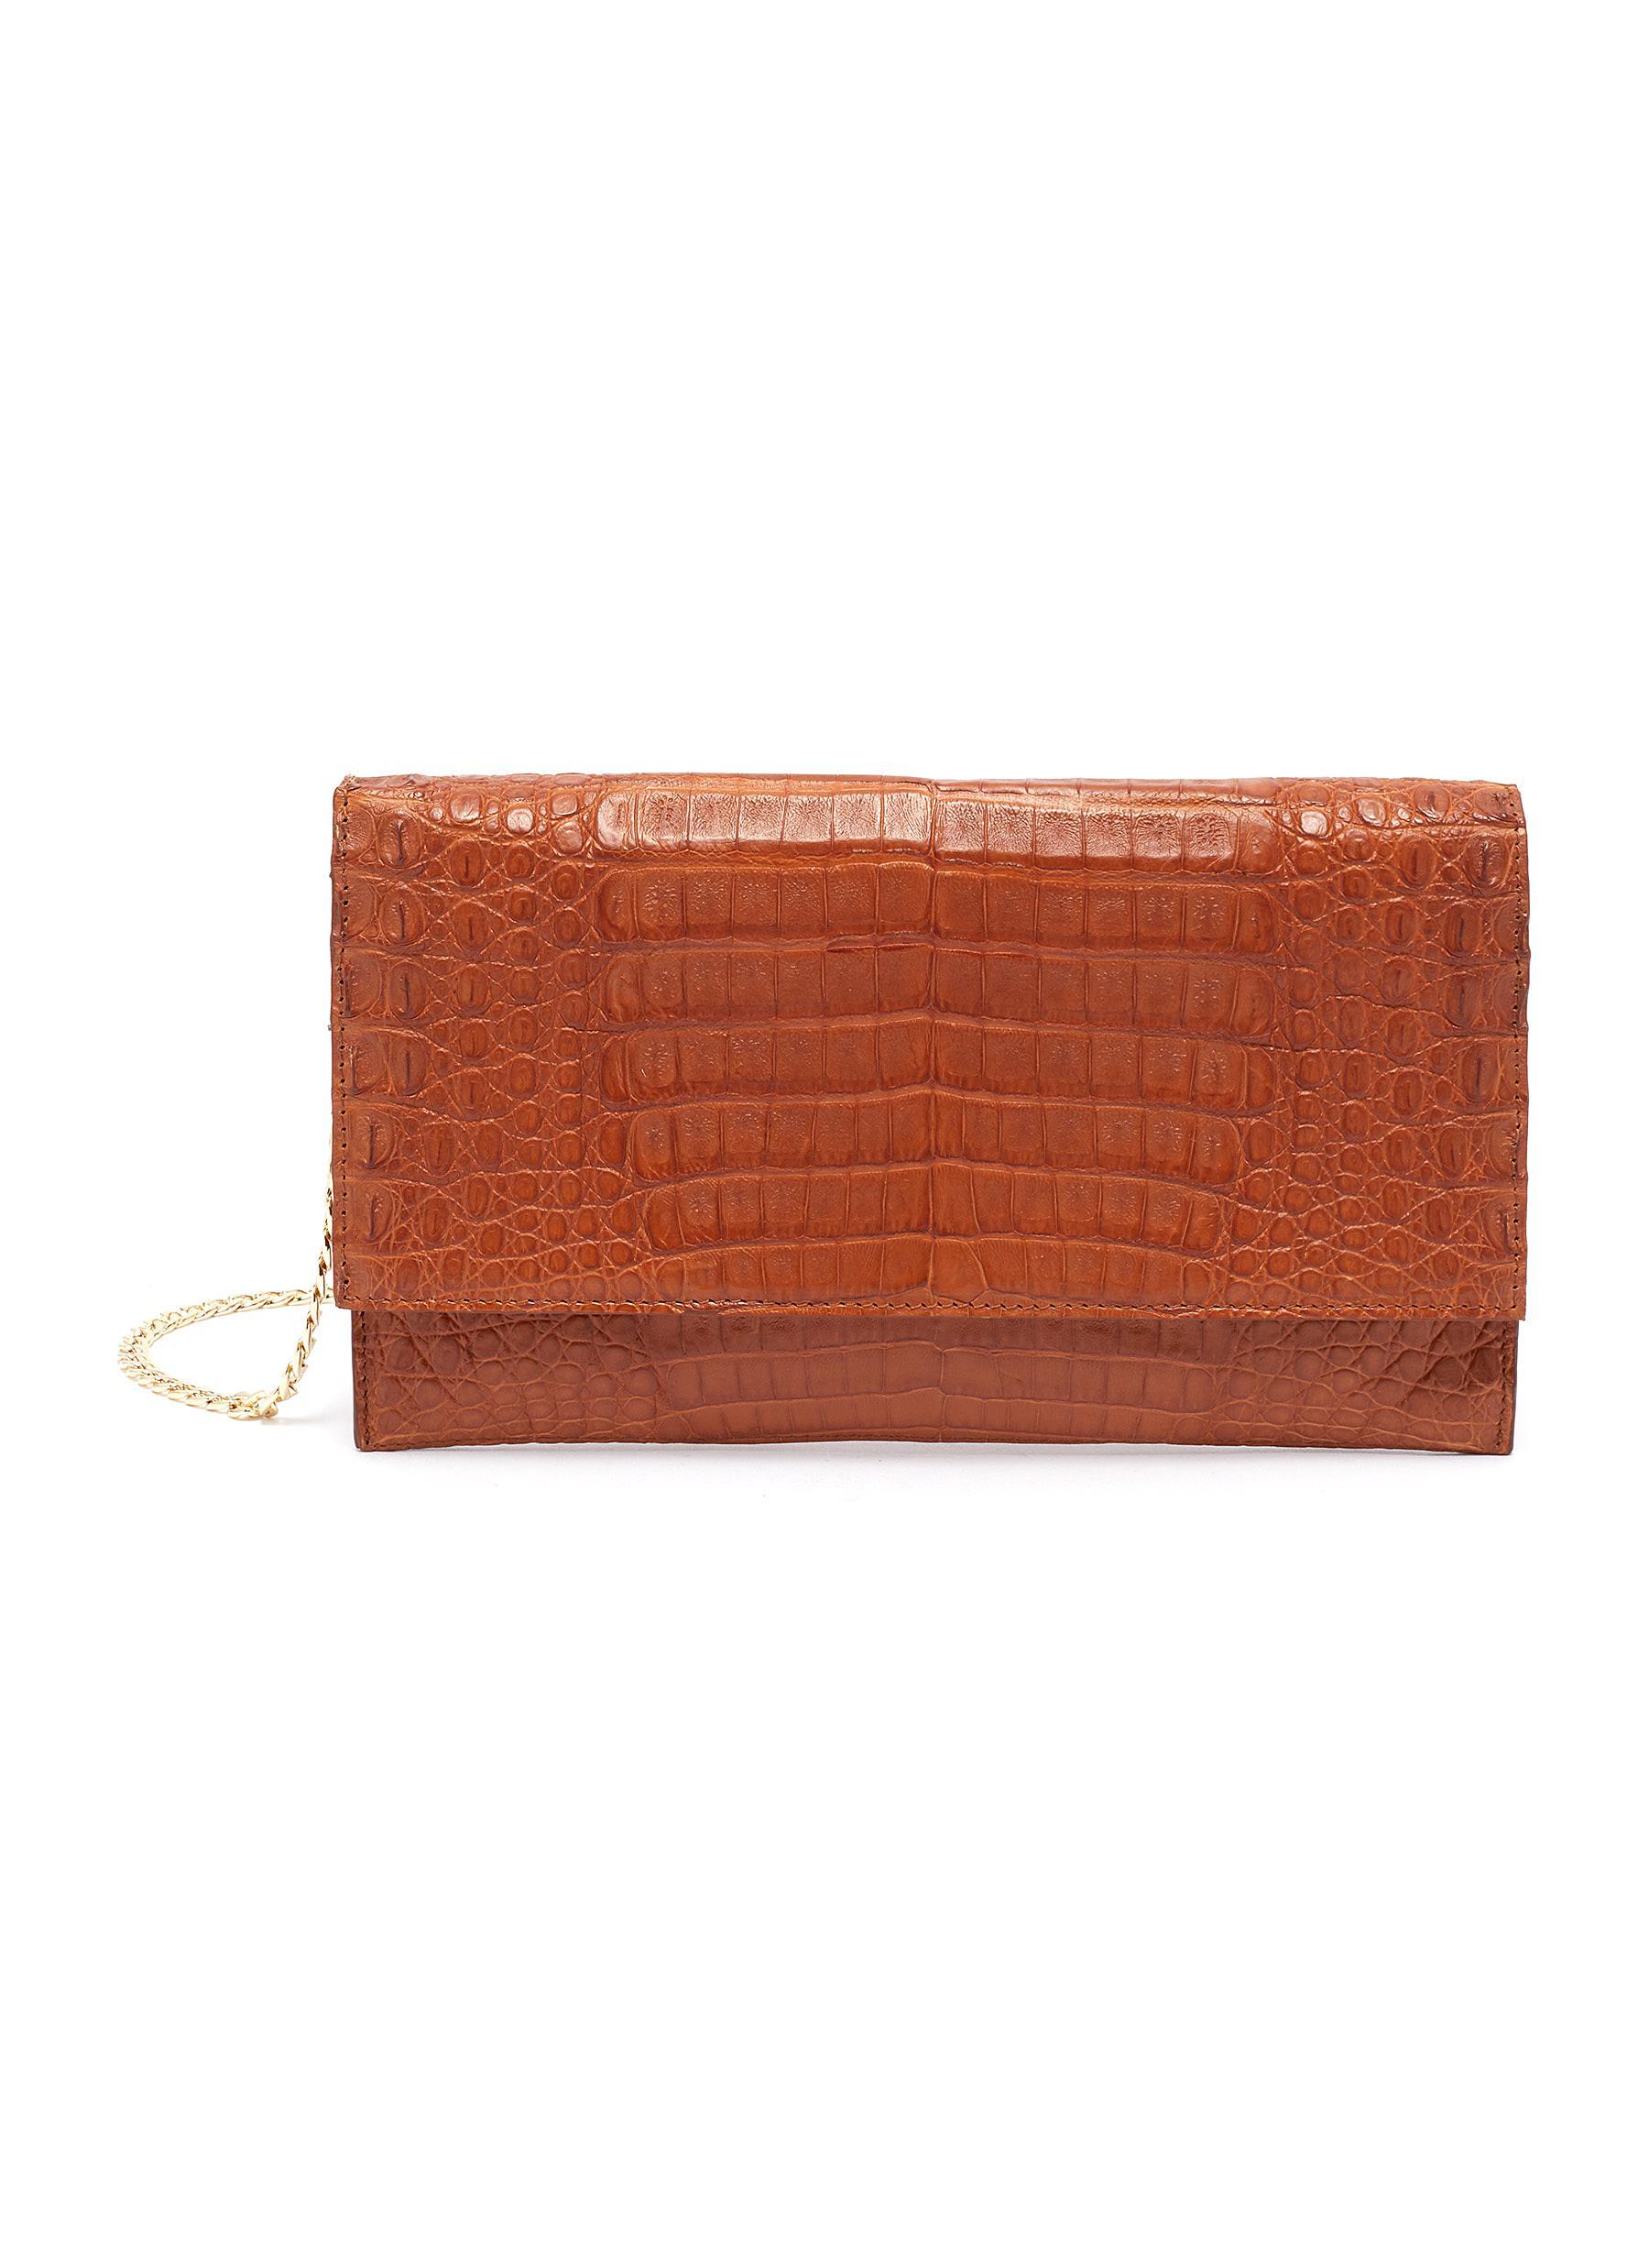 Sofia' Matte Crocodile Leather Clutch